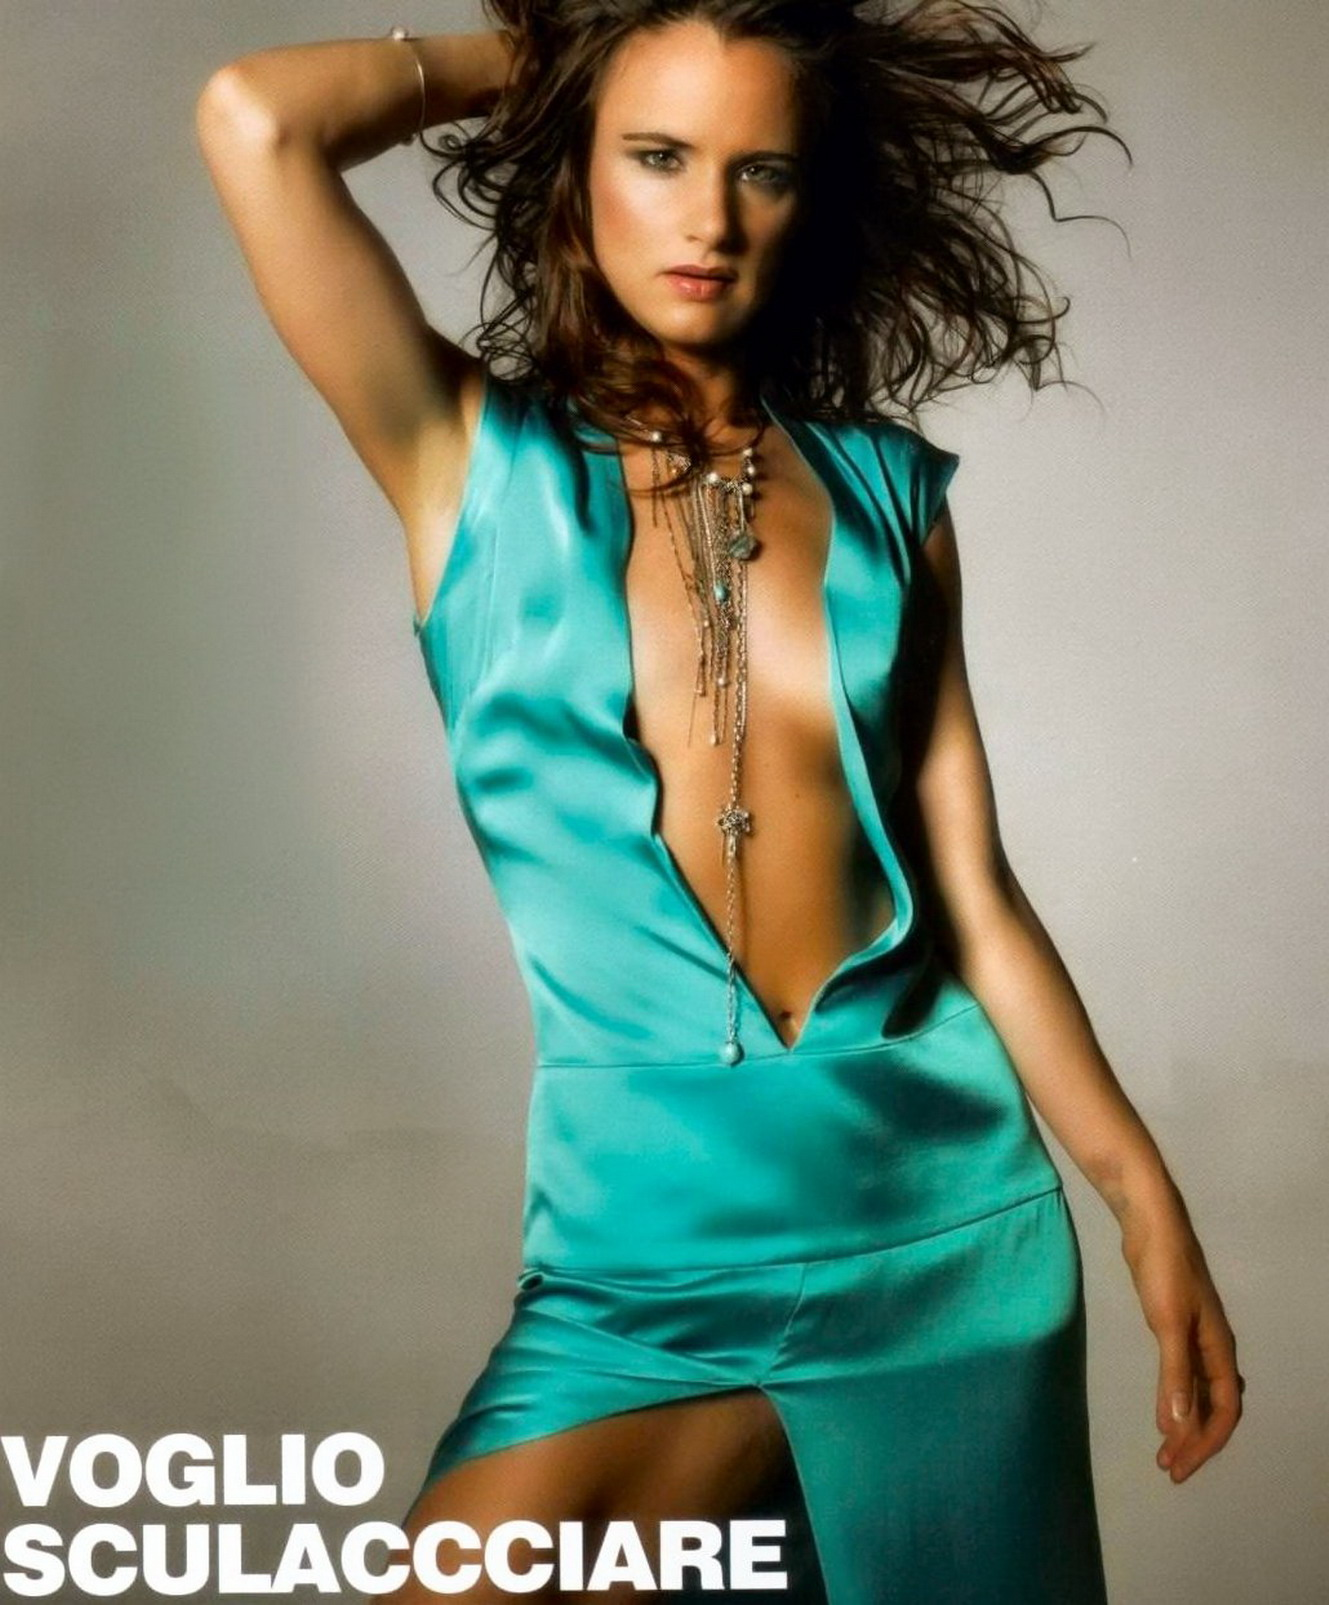 Fotos atractivas de juliette lewis